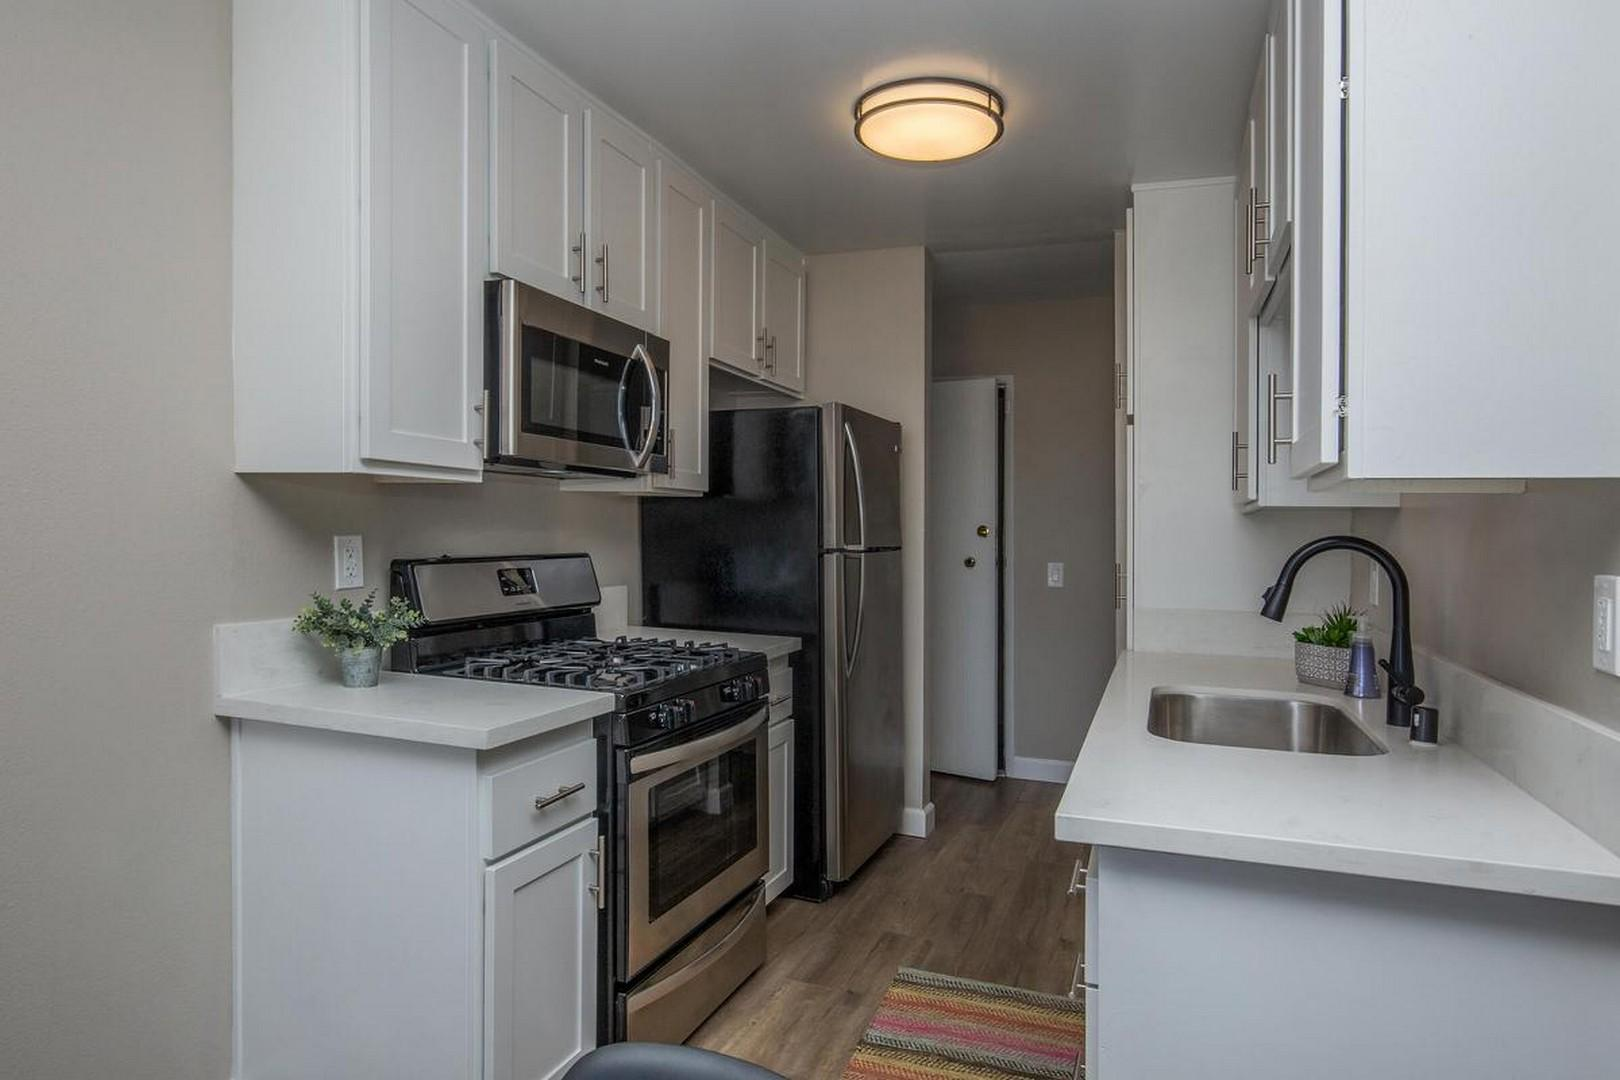 1377 E Windsor Rd #310, Glendale, CA - $1,905 USD/ month